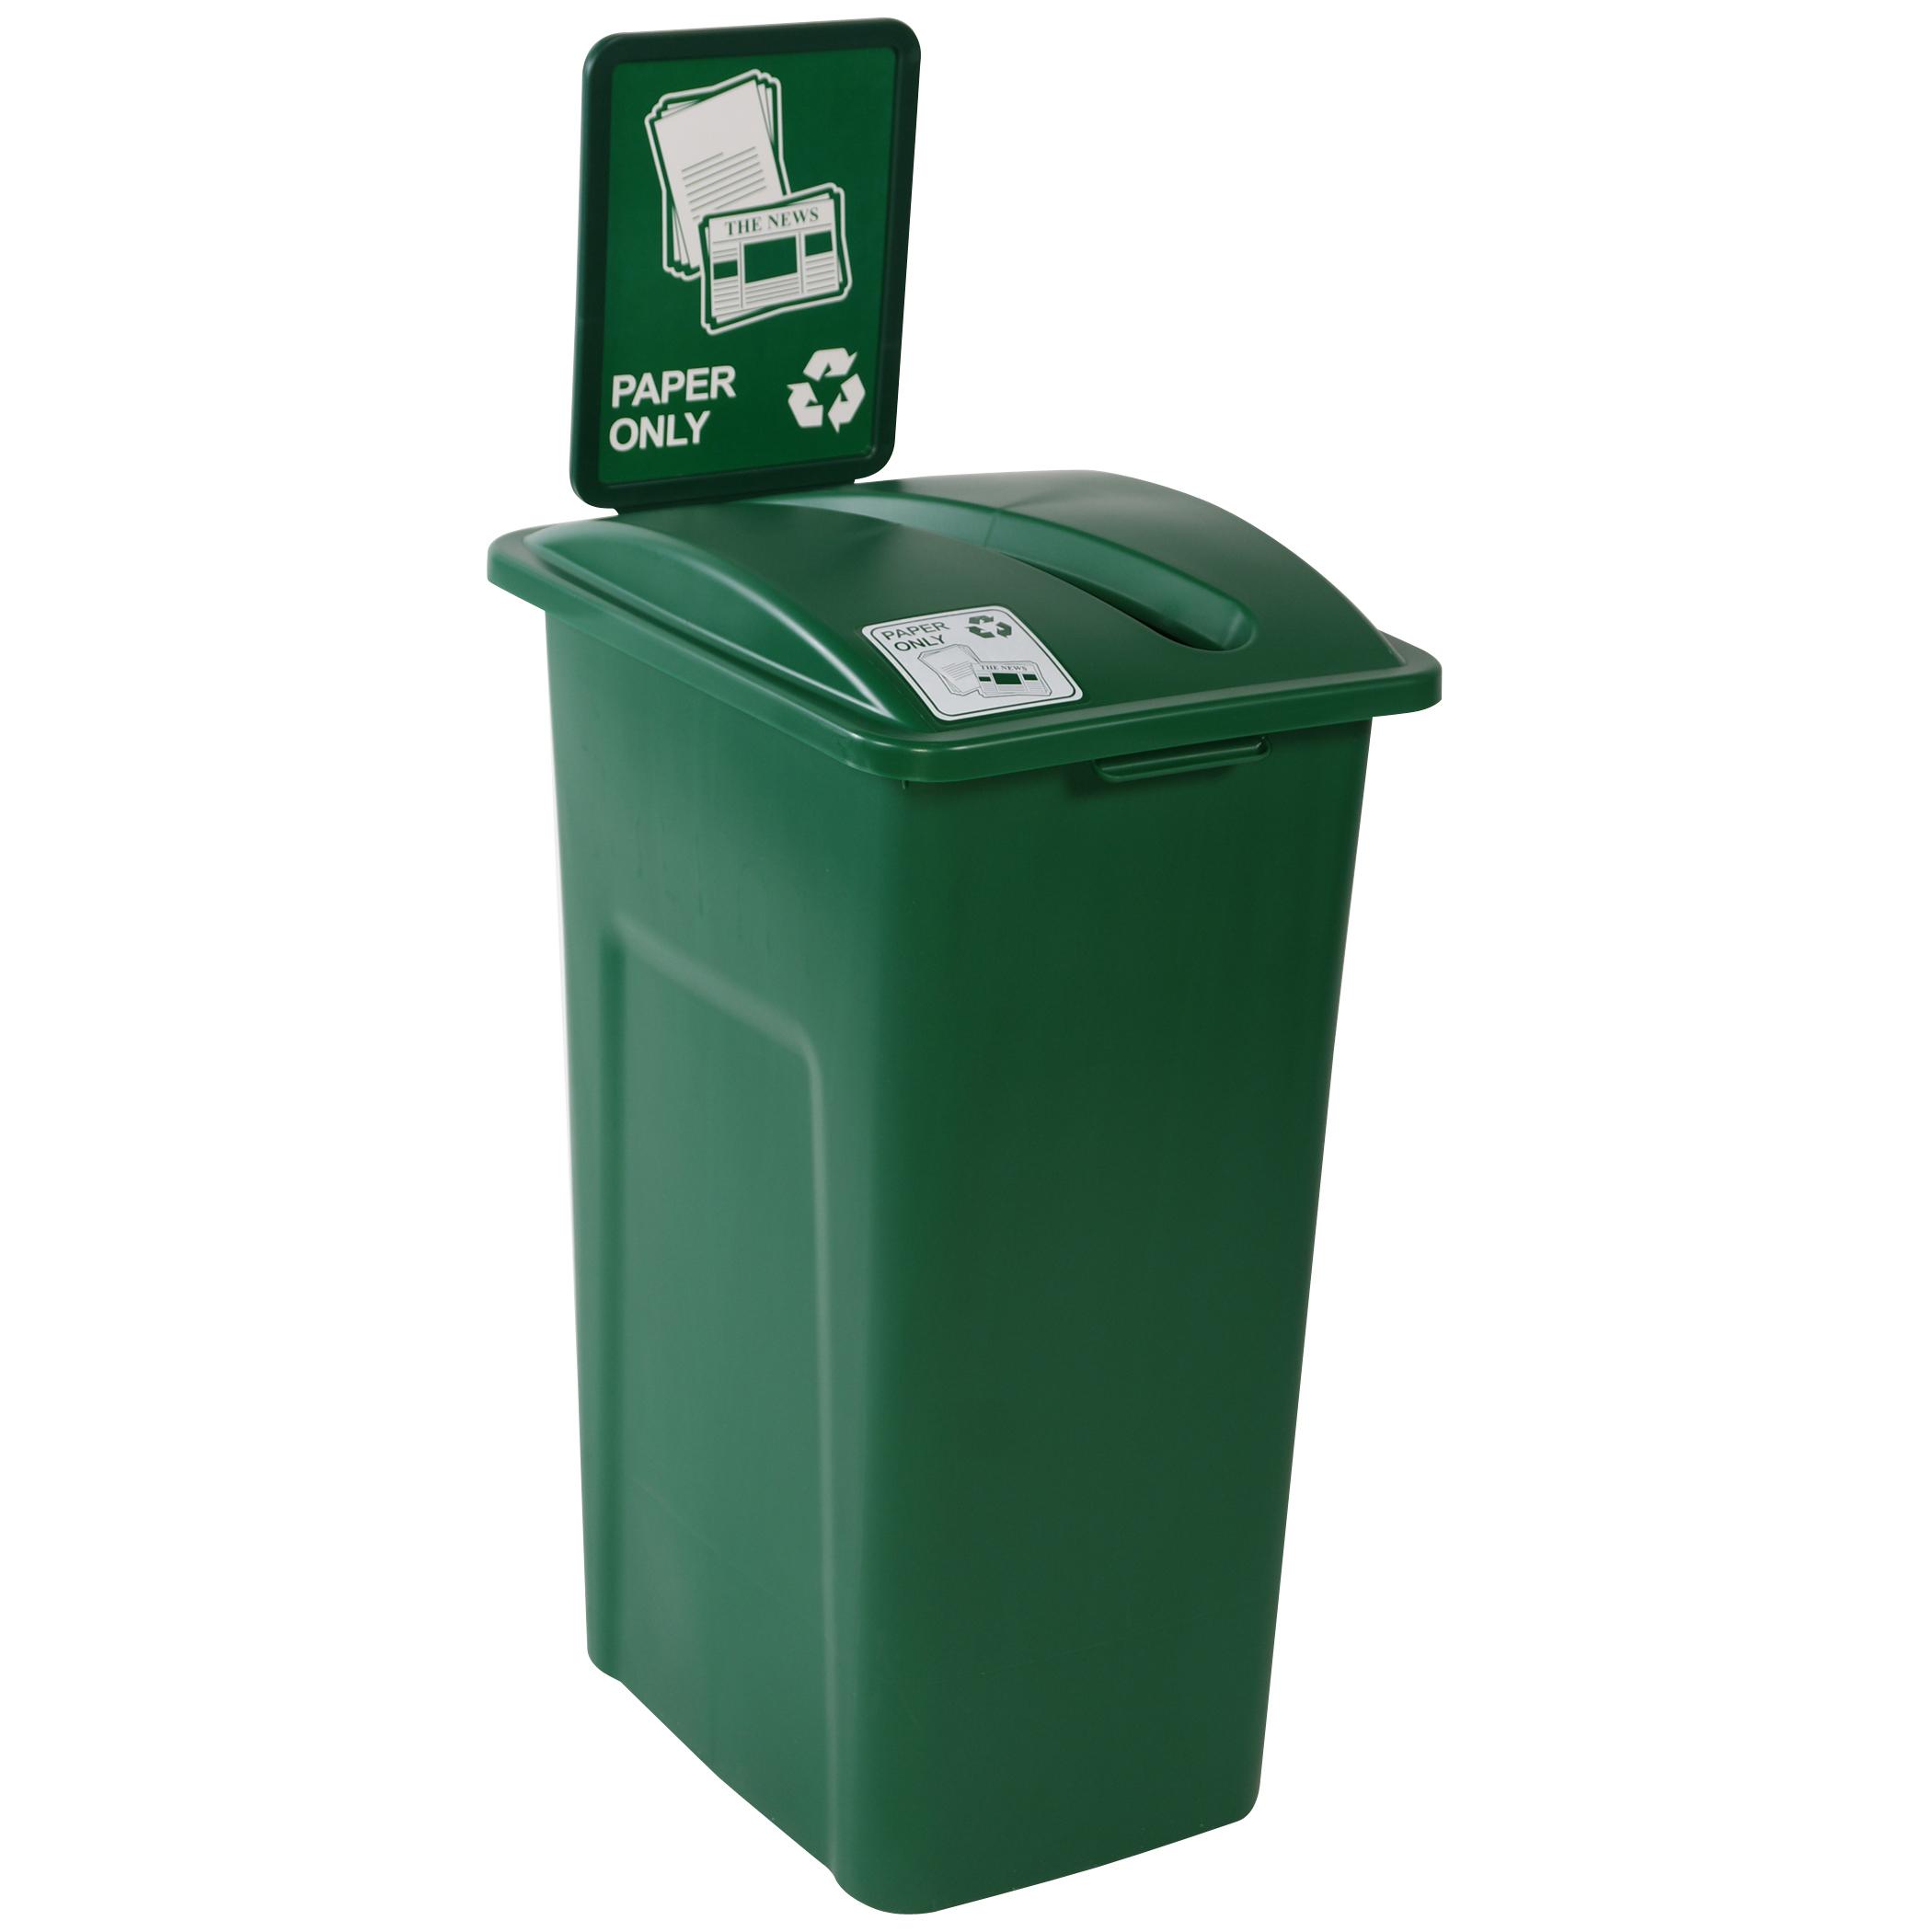 32 gallon recycling bin recycling bin for sale. Black Bedroom Furniture Sets. Home Design Ideas